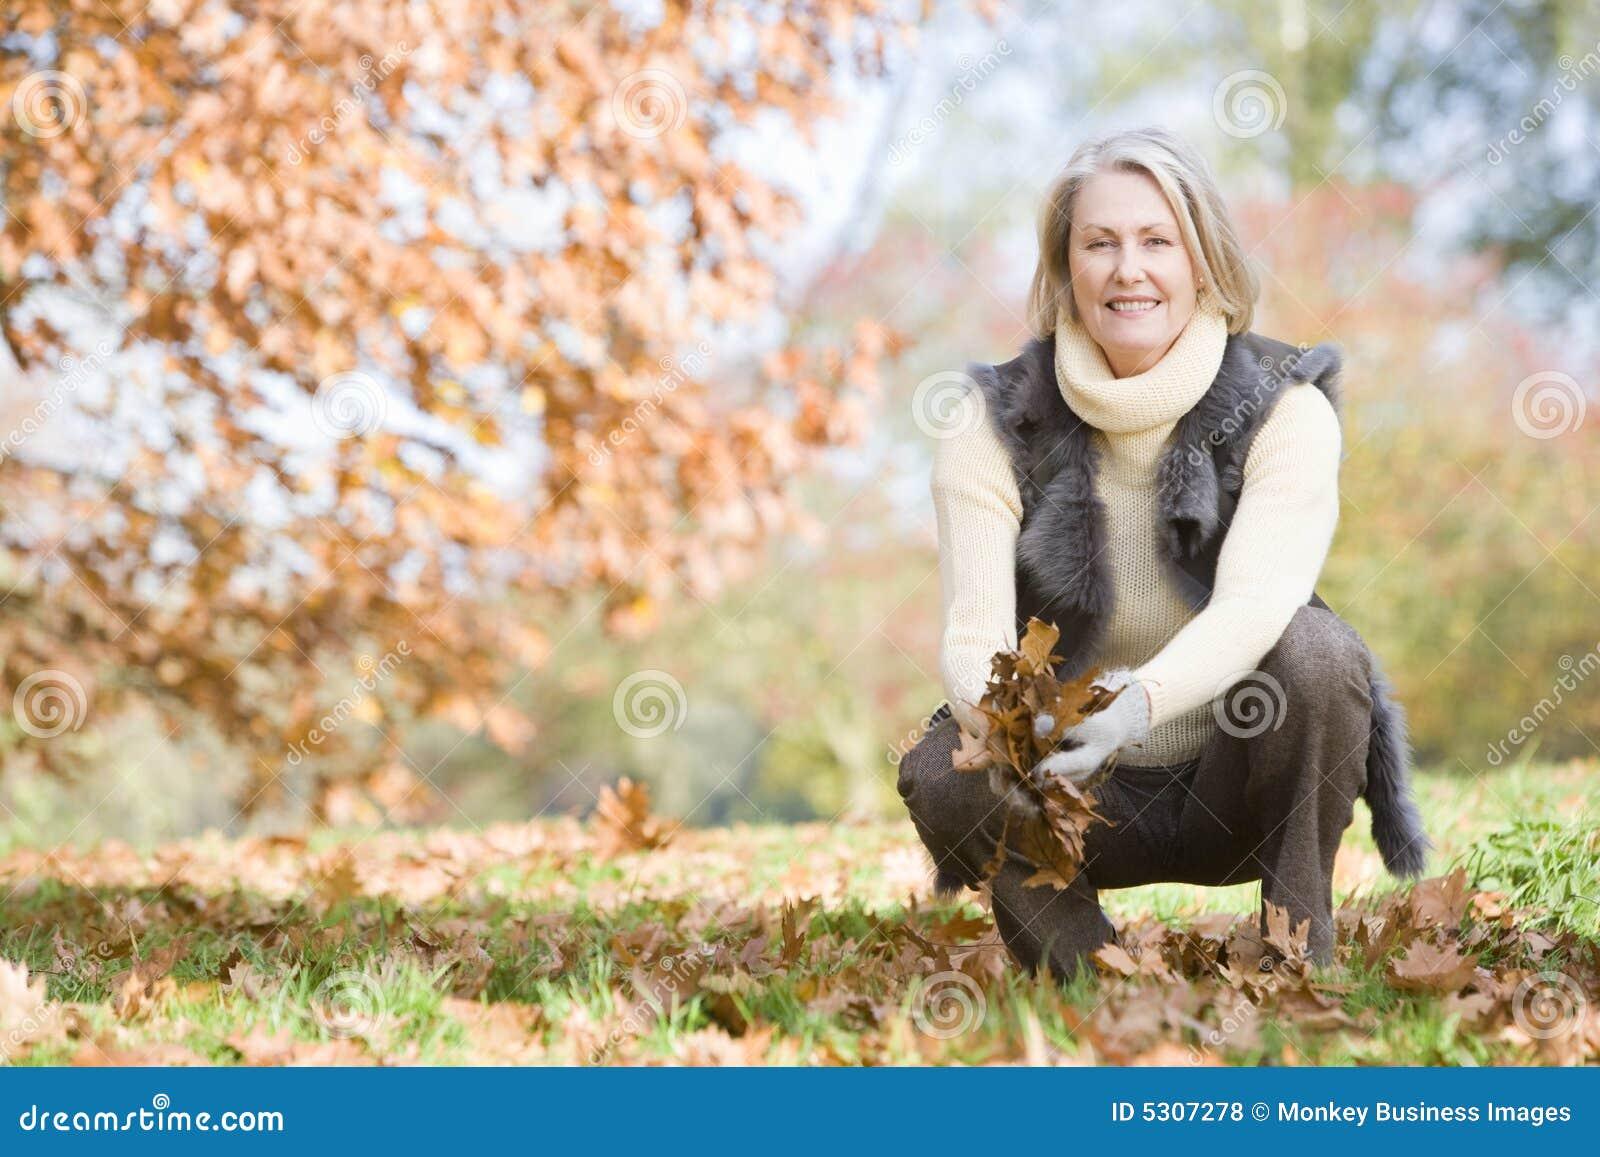 Collecting leaves senior walk woman